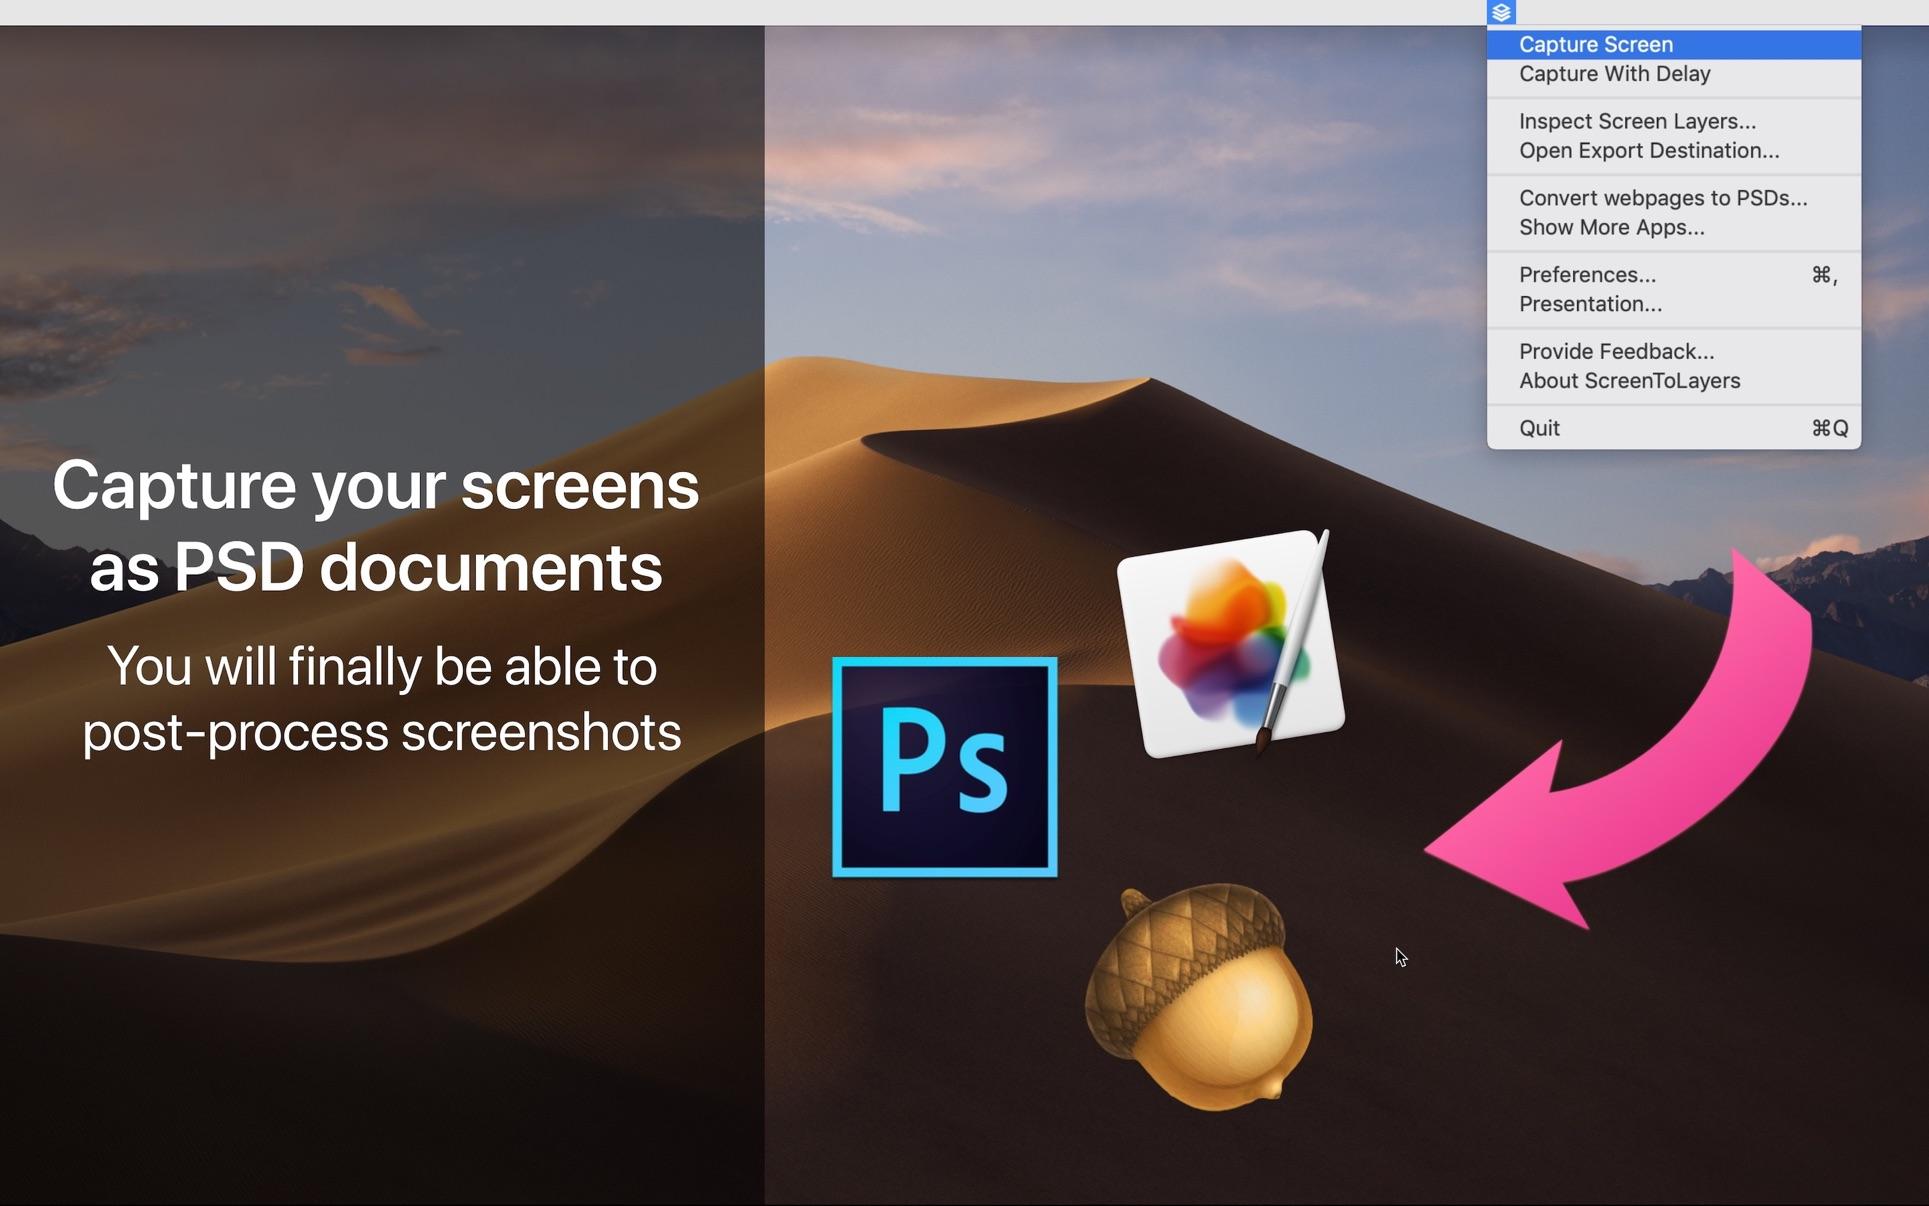 ScreenToLayers Mac 免费版 屏幕截图转Photoshop文档-麦氪派(WaitsUn.com | 爱情守望者)